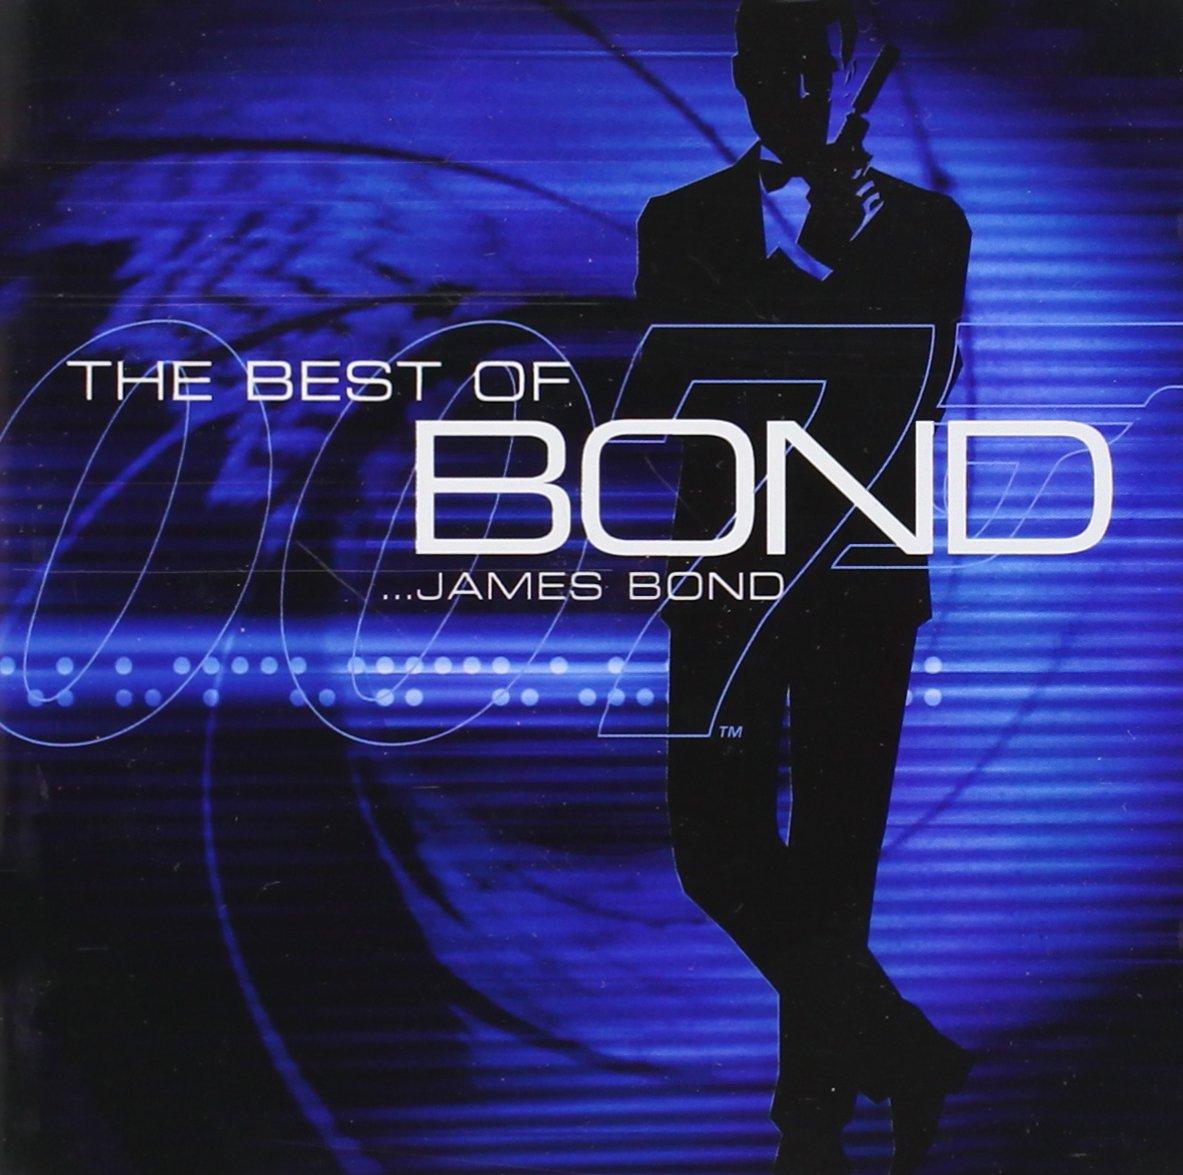 The Best of Bond ...James Bond : DIV 2155